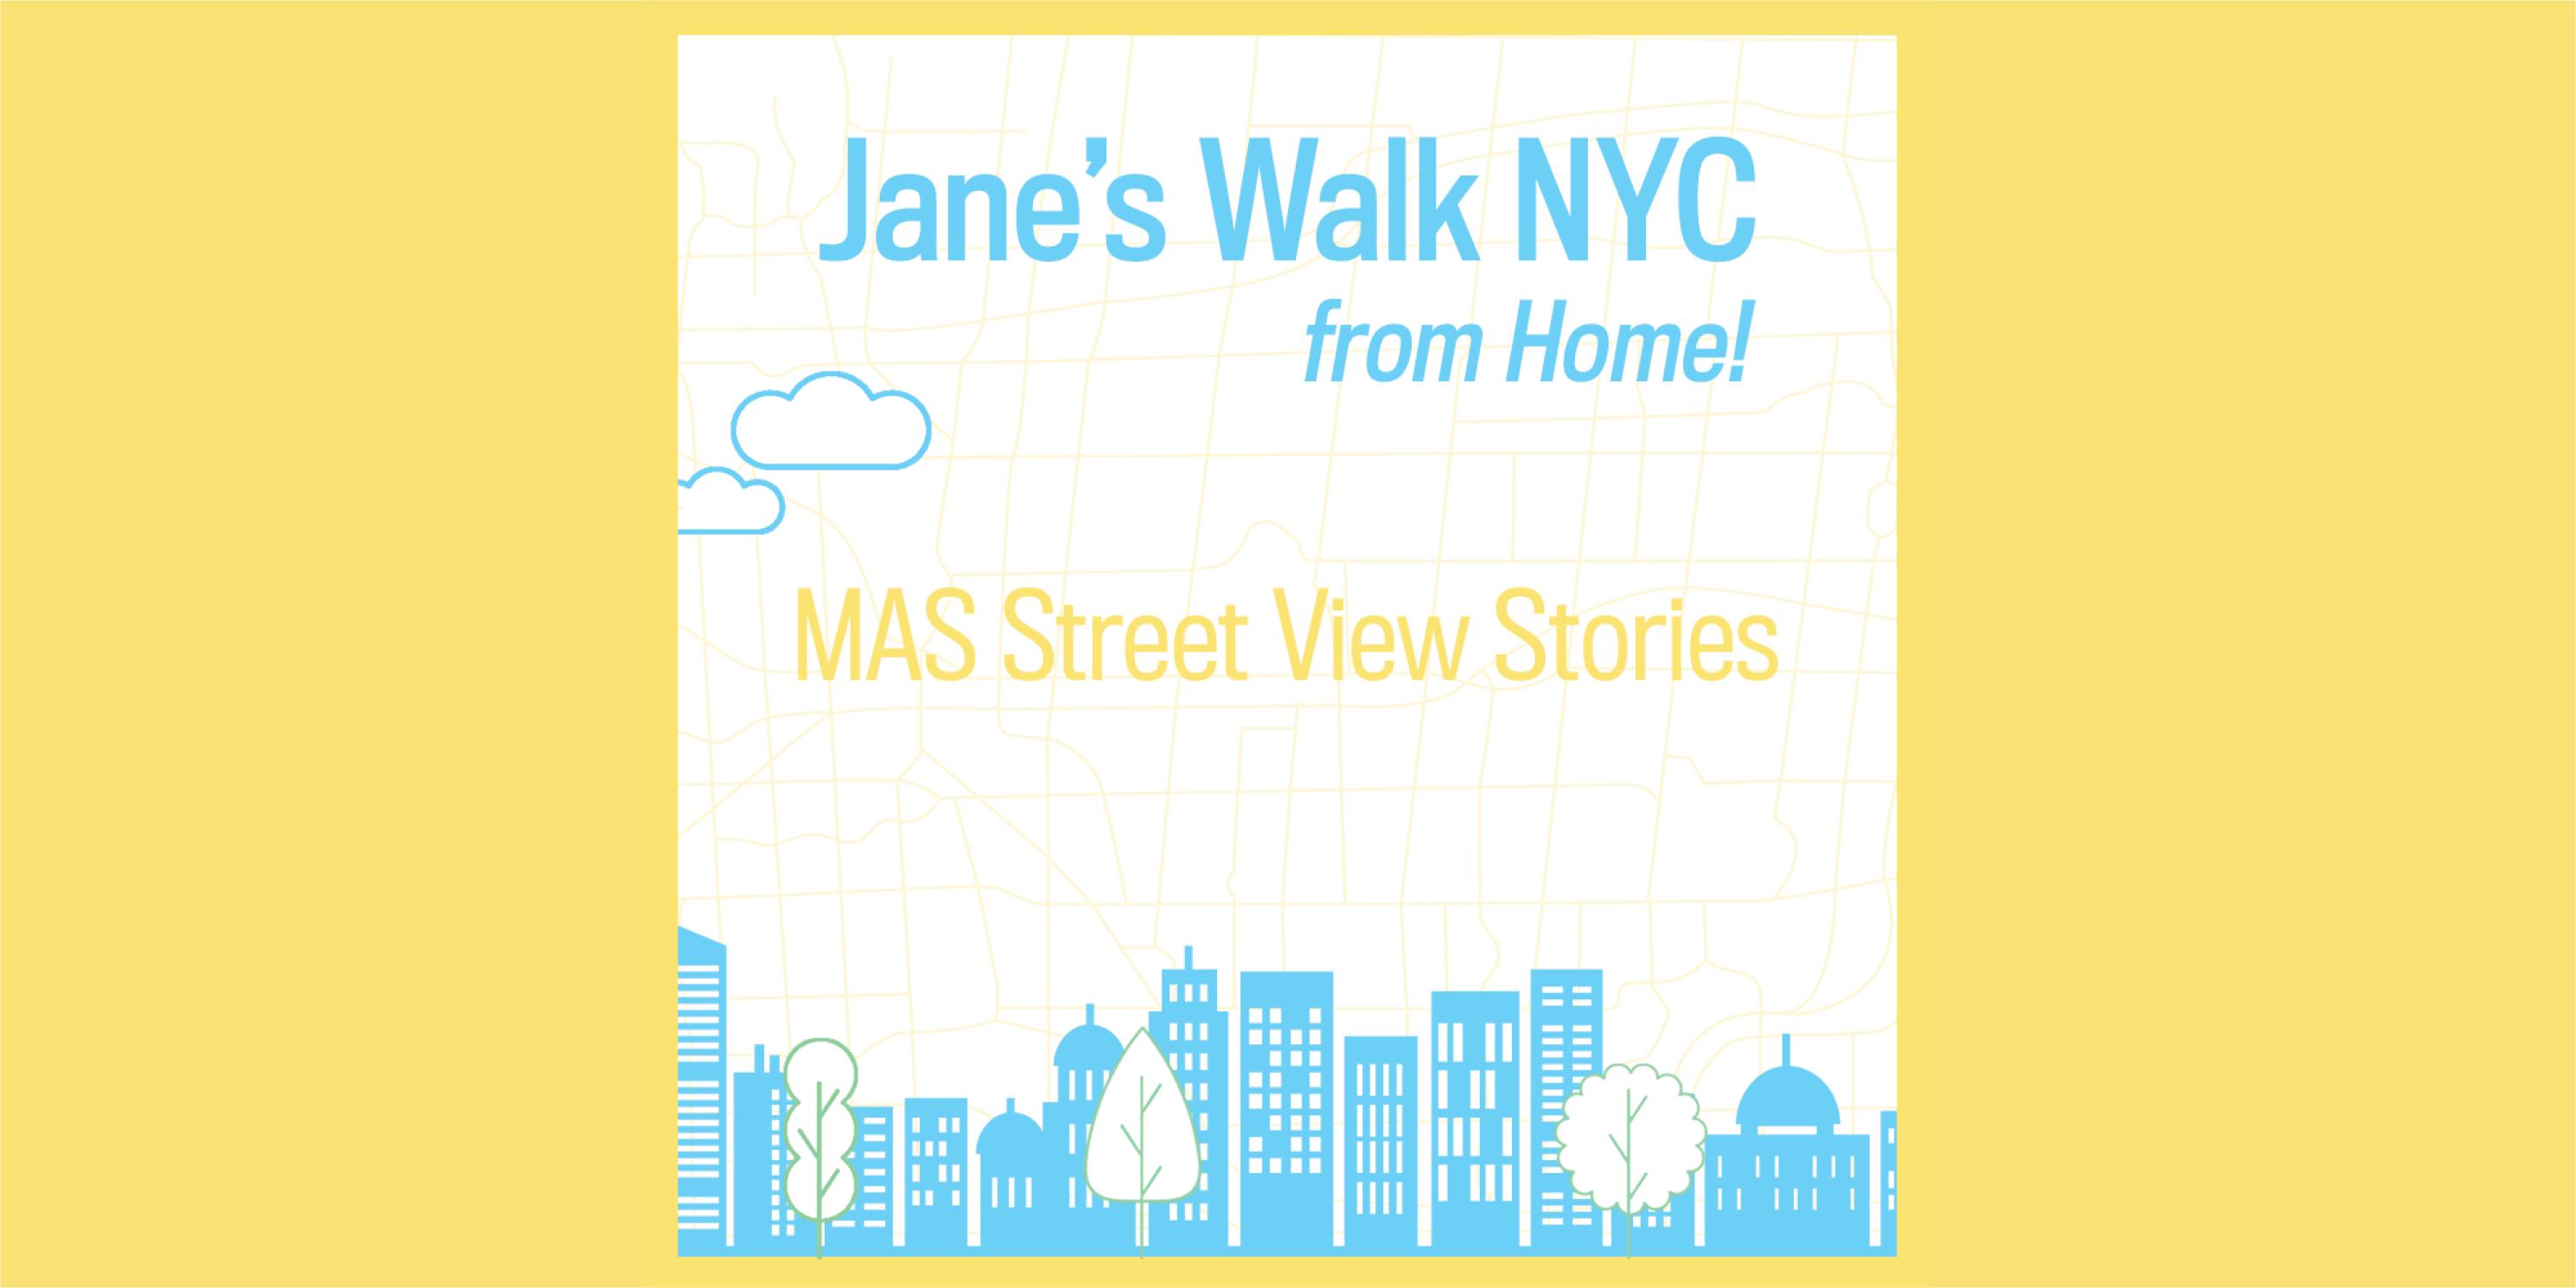 Advertisement for Jane's Walk 2020, Day 6 activities